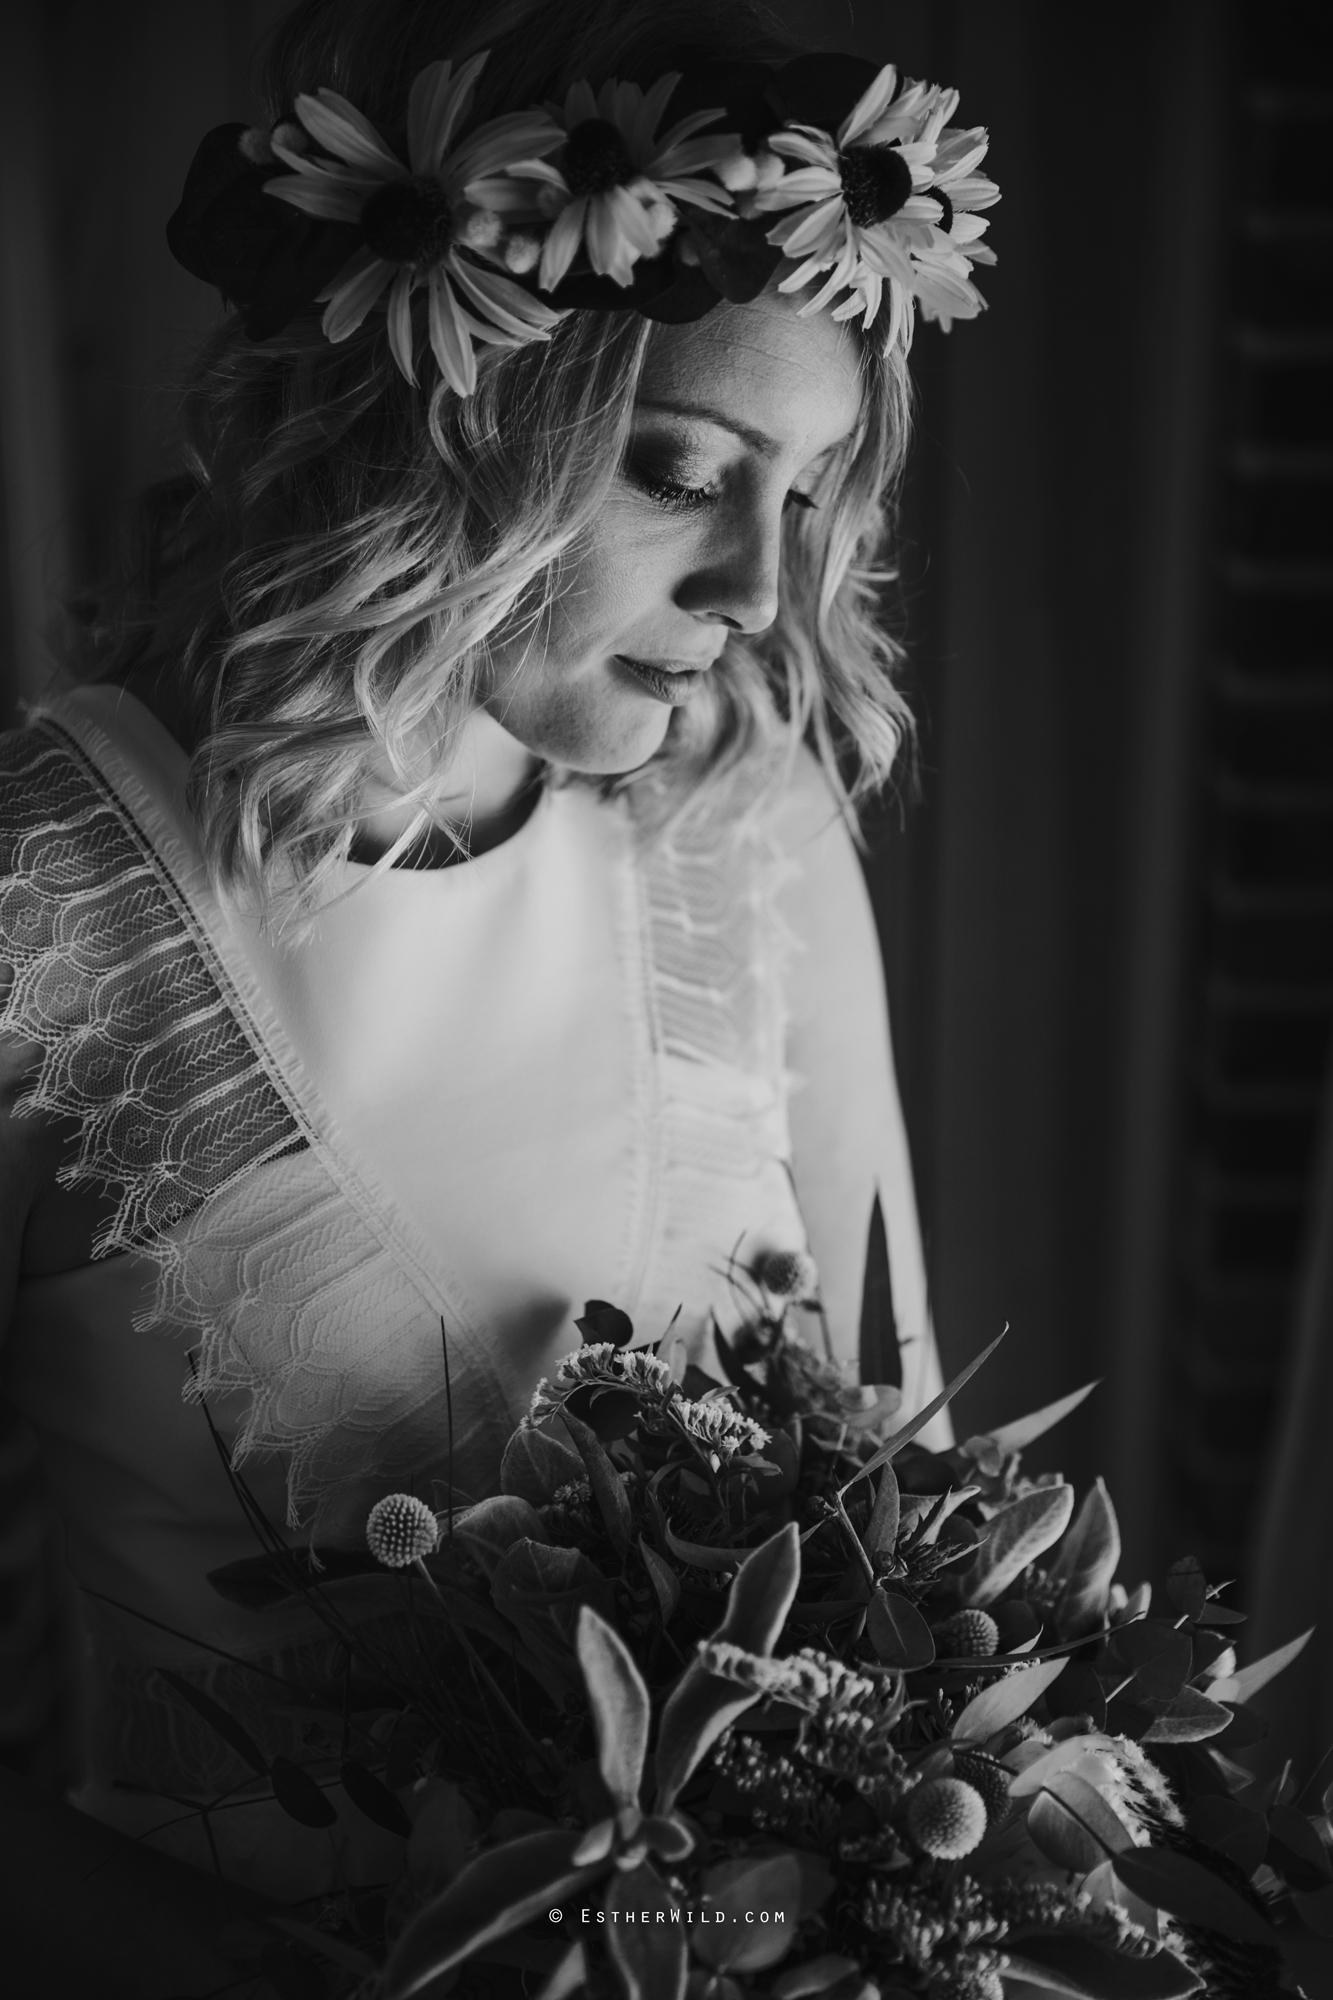 IMG_0451-2Cley_Barn_Drift_Norfolk_Coast_Wedding_Copyright_Esther_Wild_Photographer_.jpg